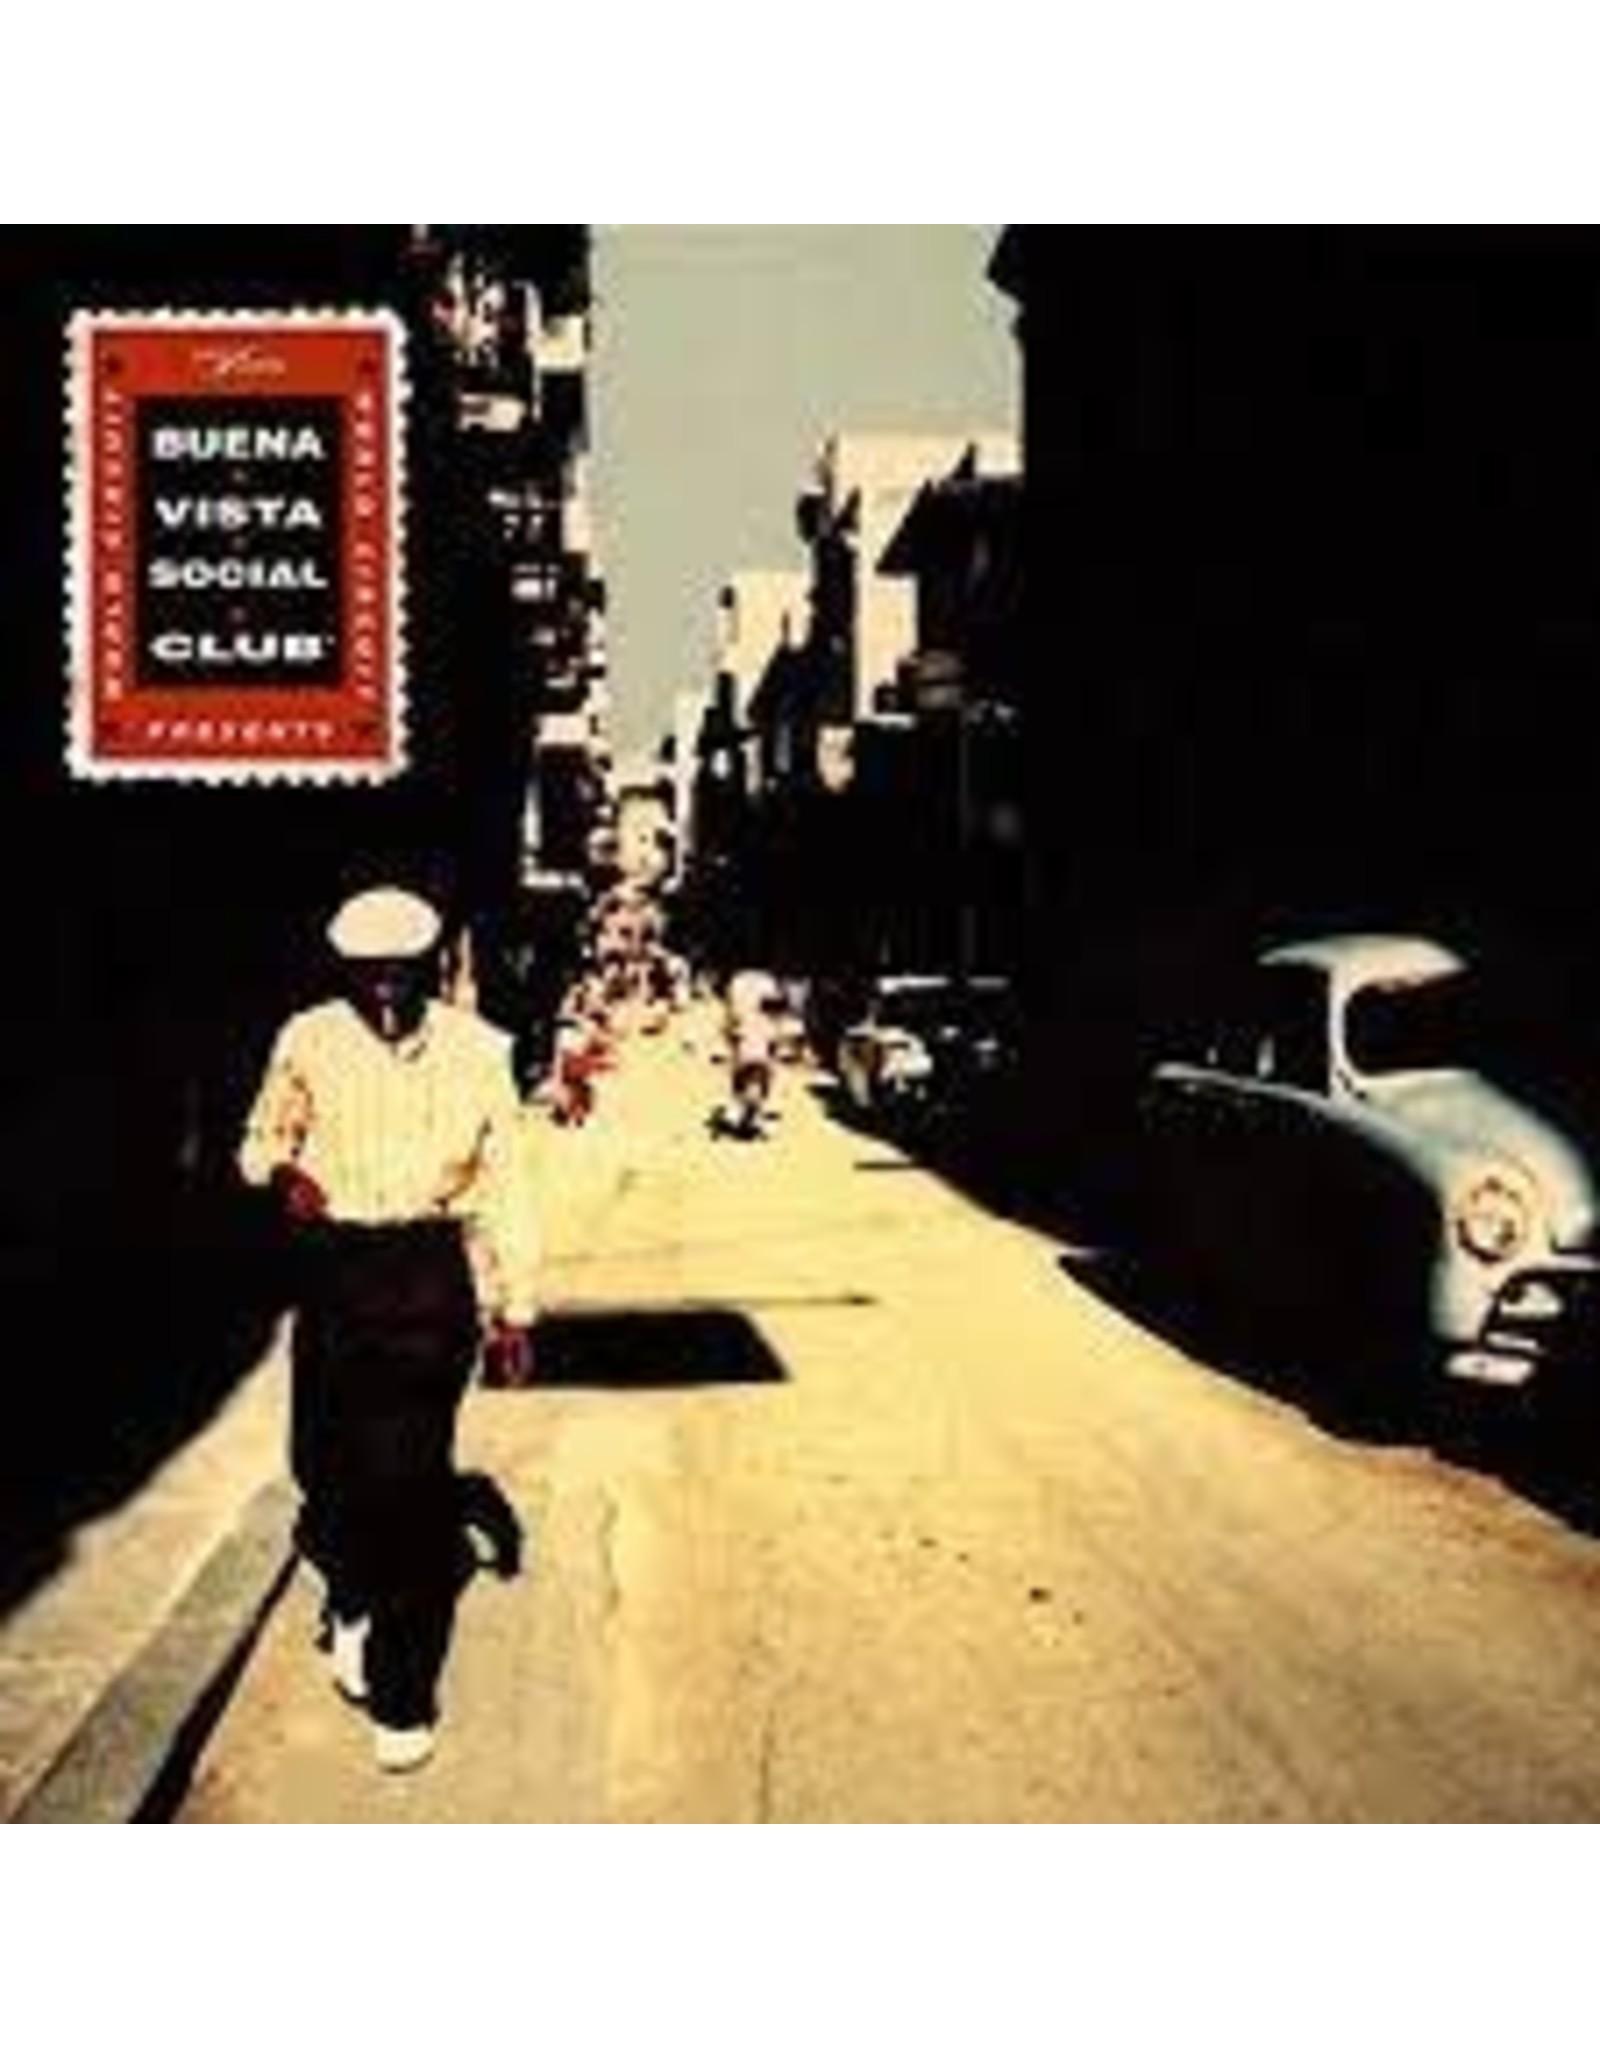 Buena Vista Social Club (25th Anniversary)